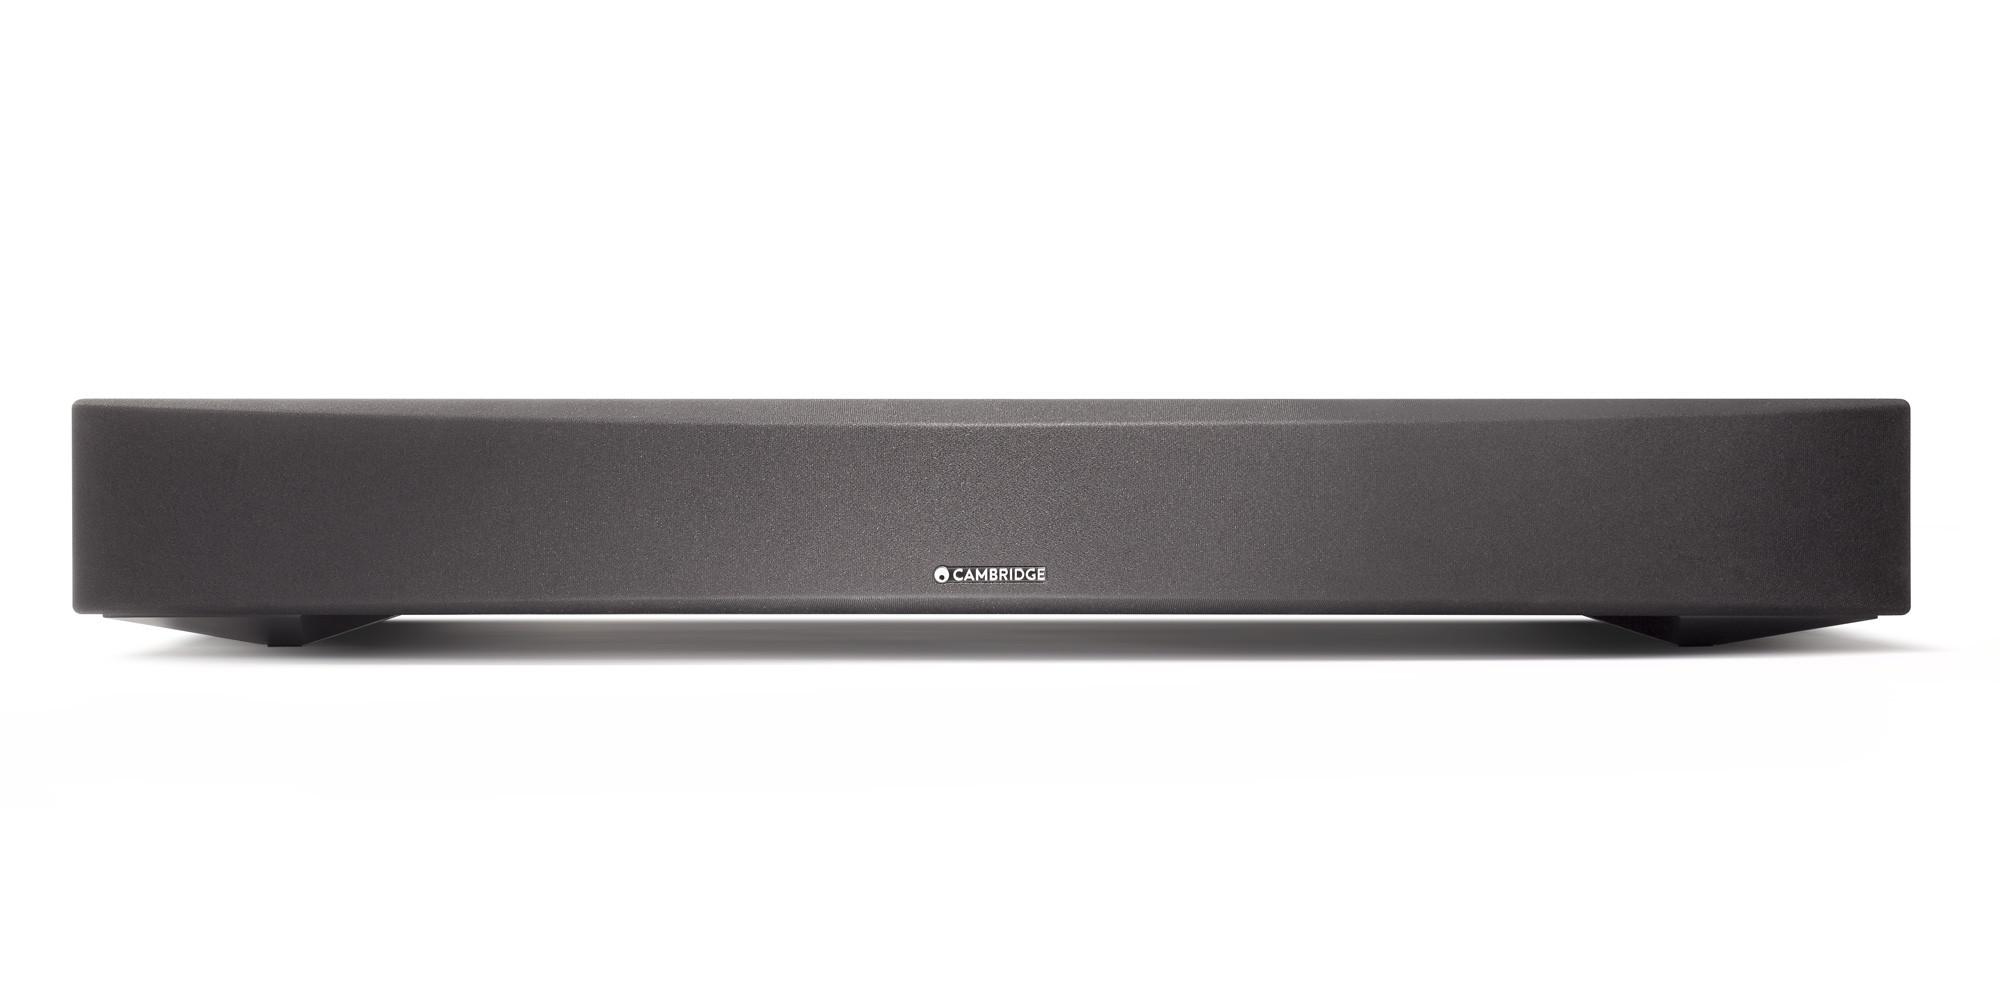 Auditorium TV5 v2 TV-Sockel-Lautsprecher mit Bluetooth #1